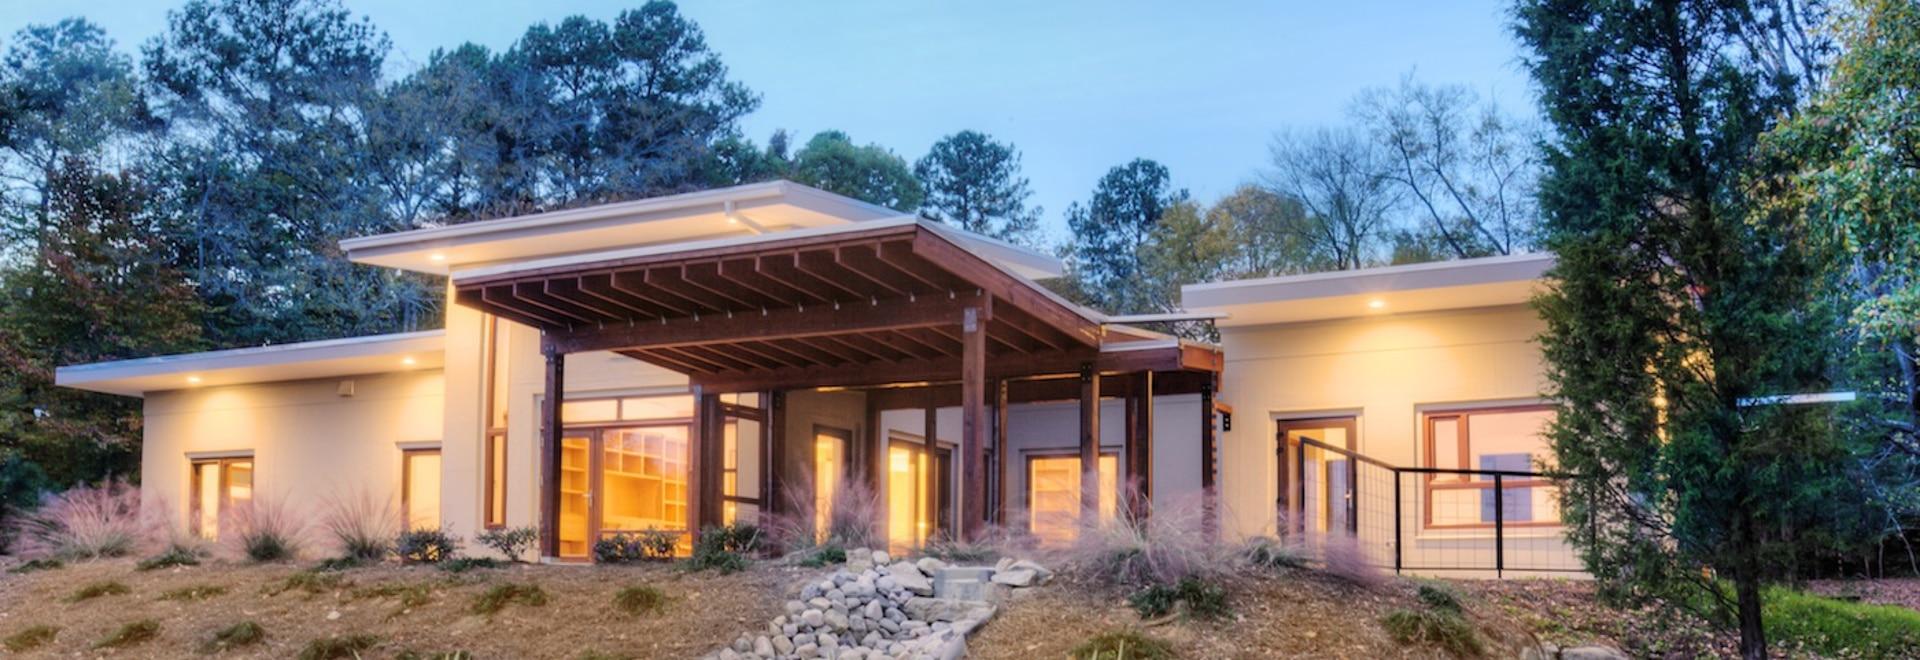 Passive house projects north carolina